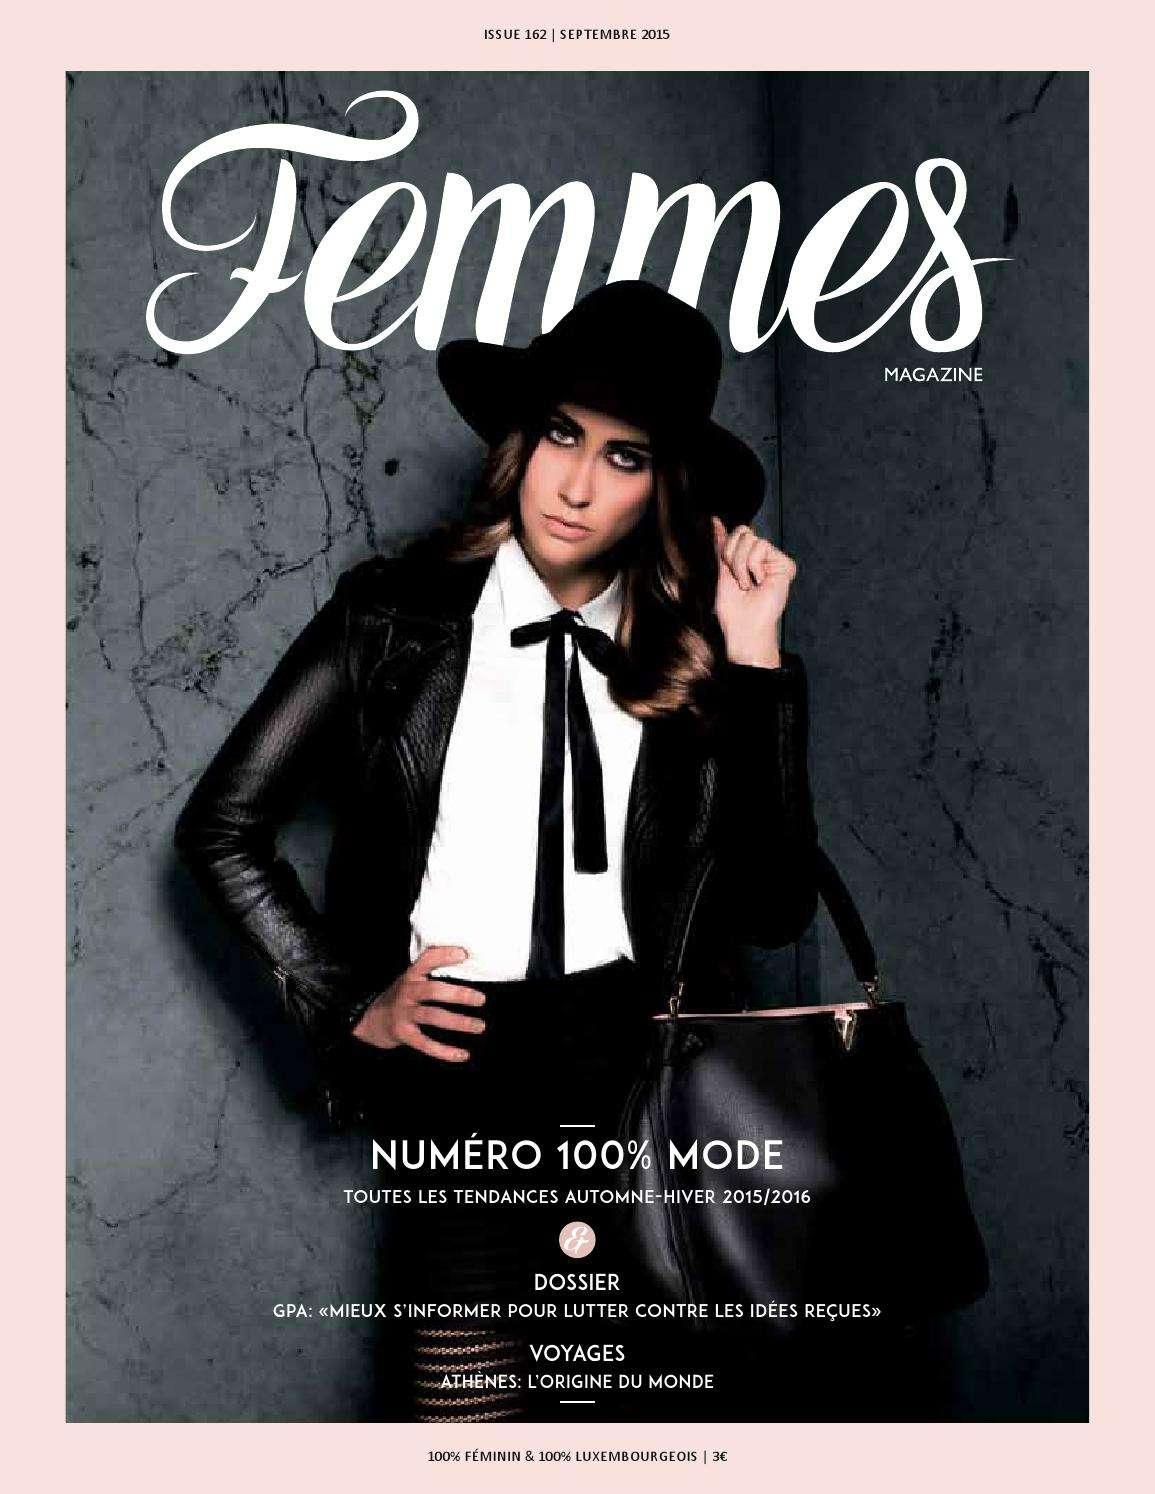 Femmes Magazine - Septembre 2015